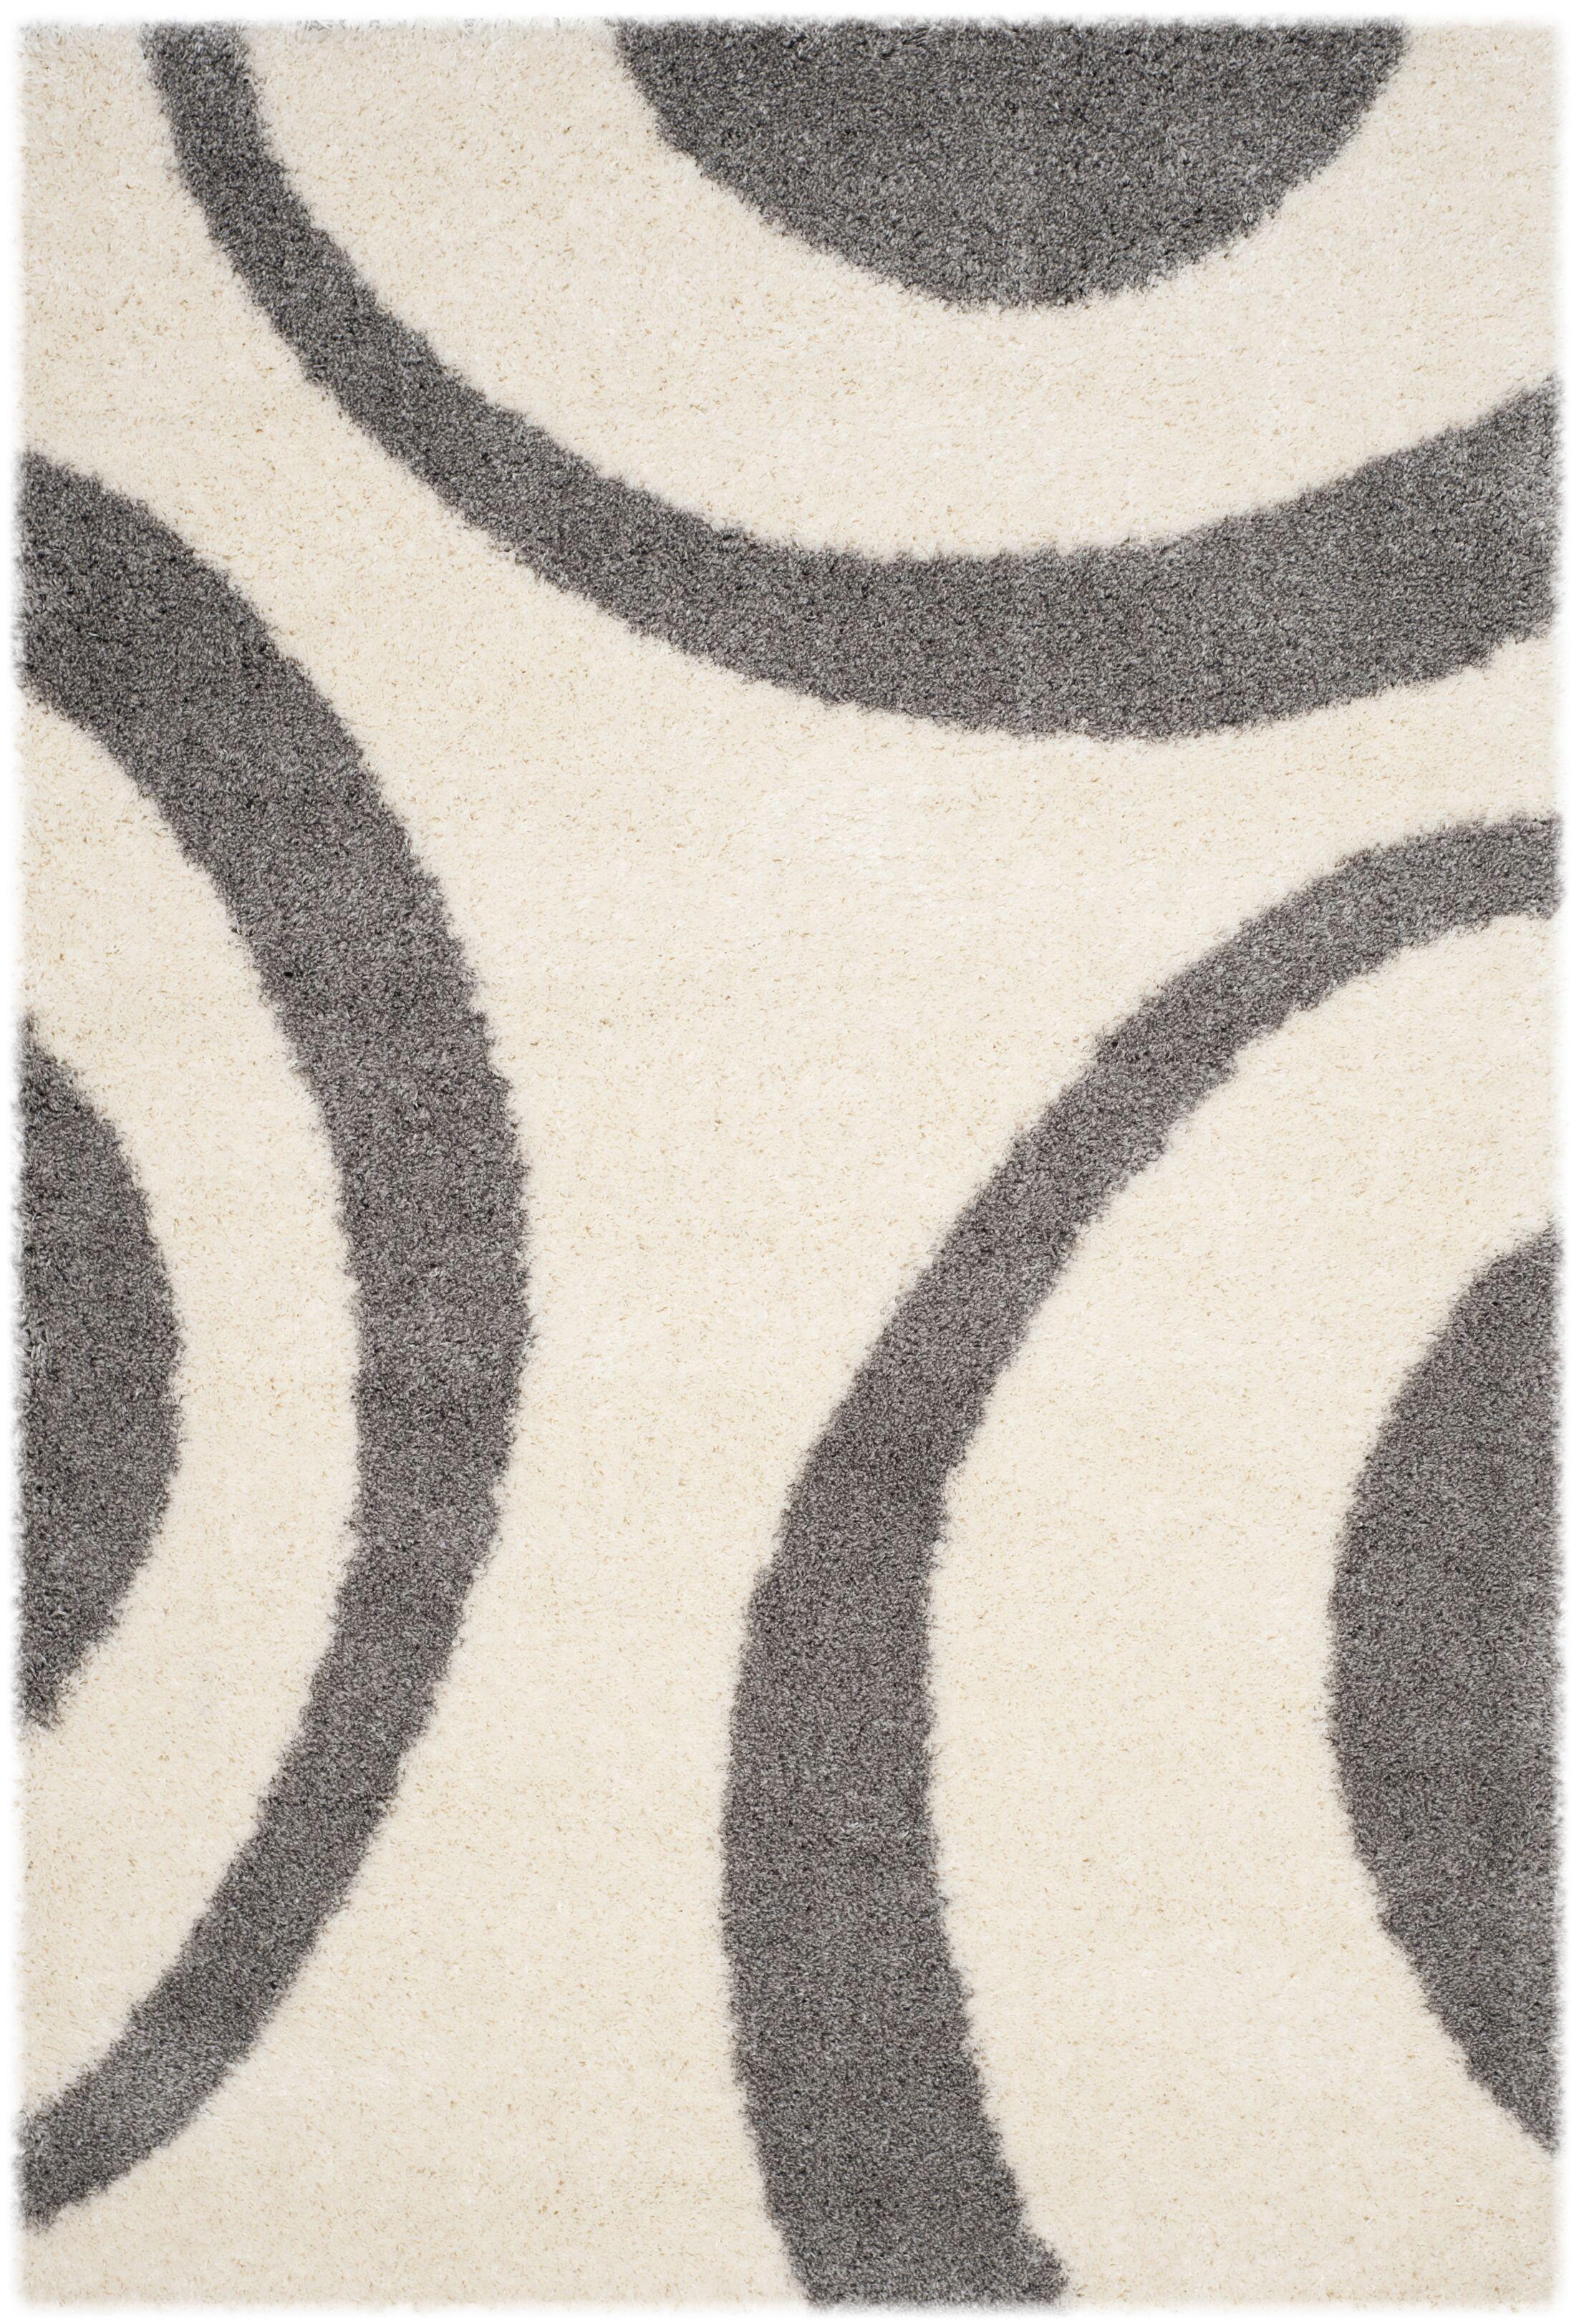 Barbara Shag Ivory/Gray Area Rug Rug Size: Rectangle 5'1